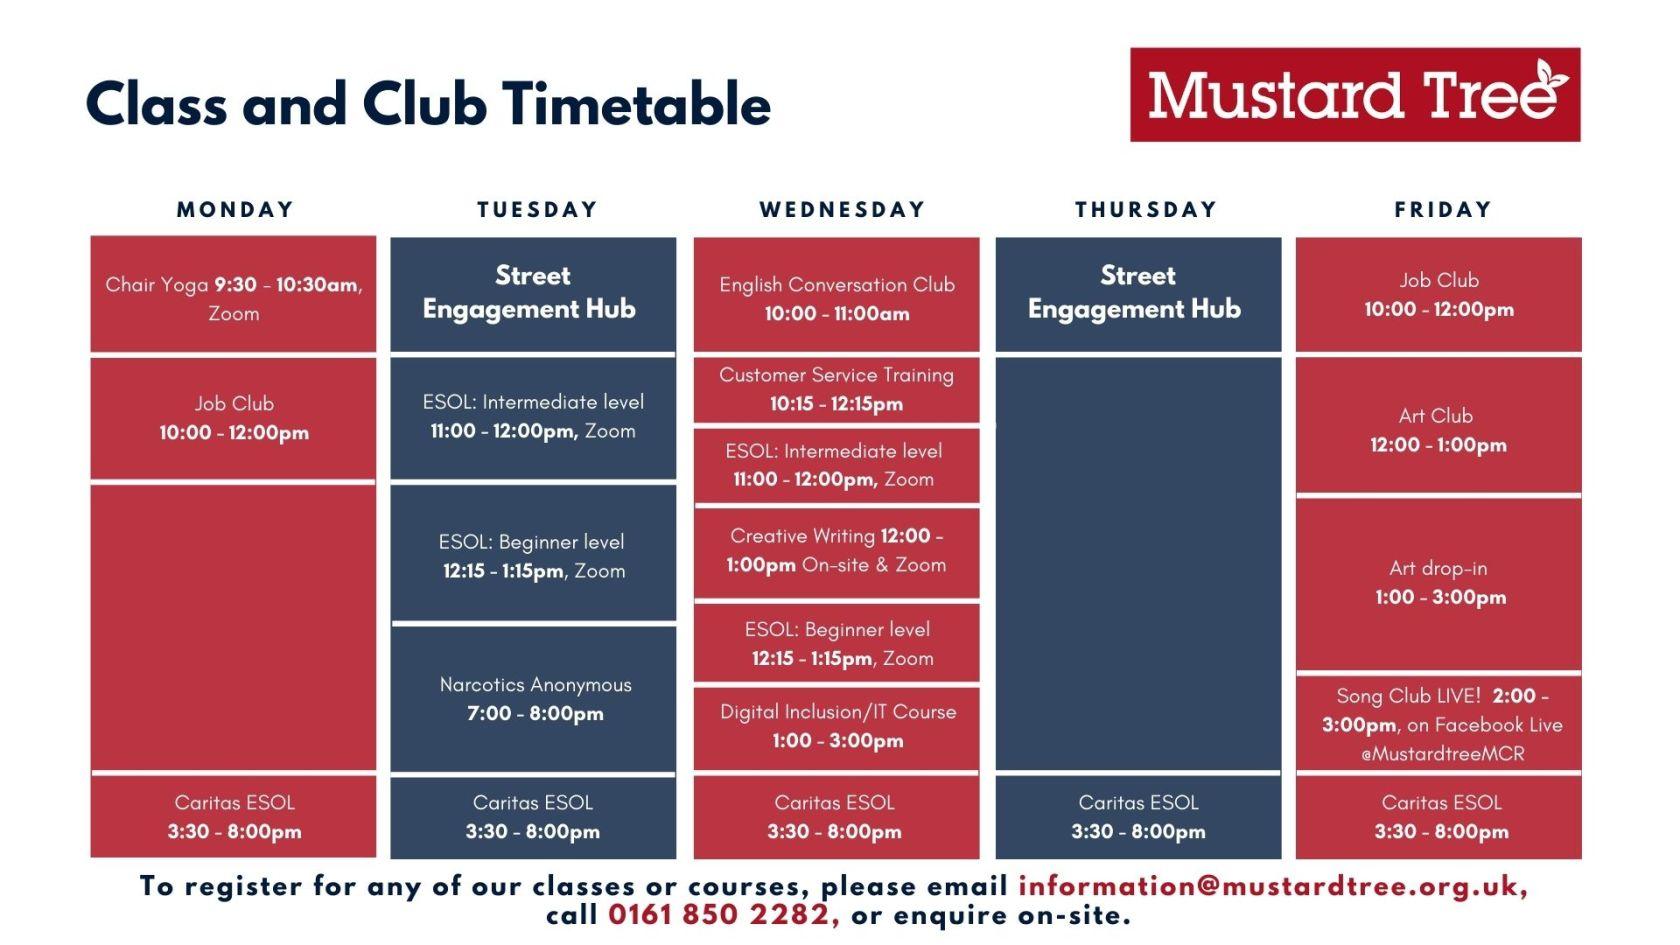 Class & Club Timetable FINAL (1)